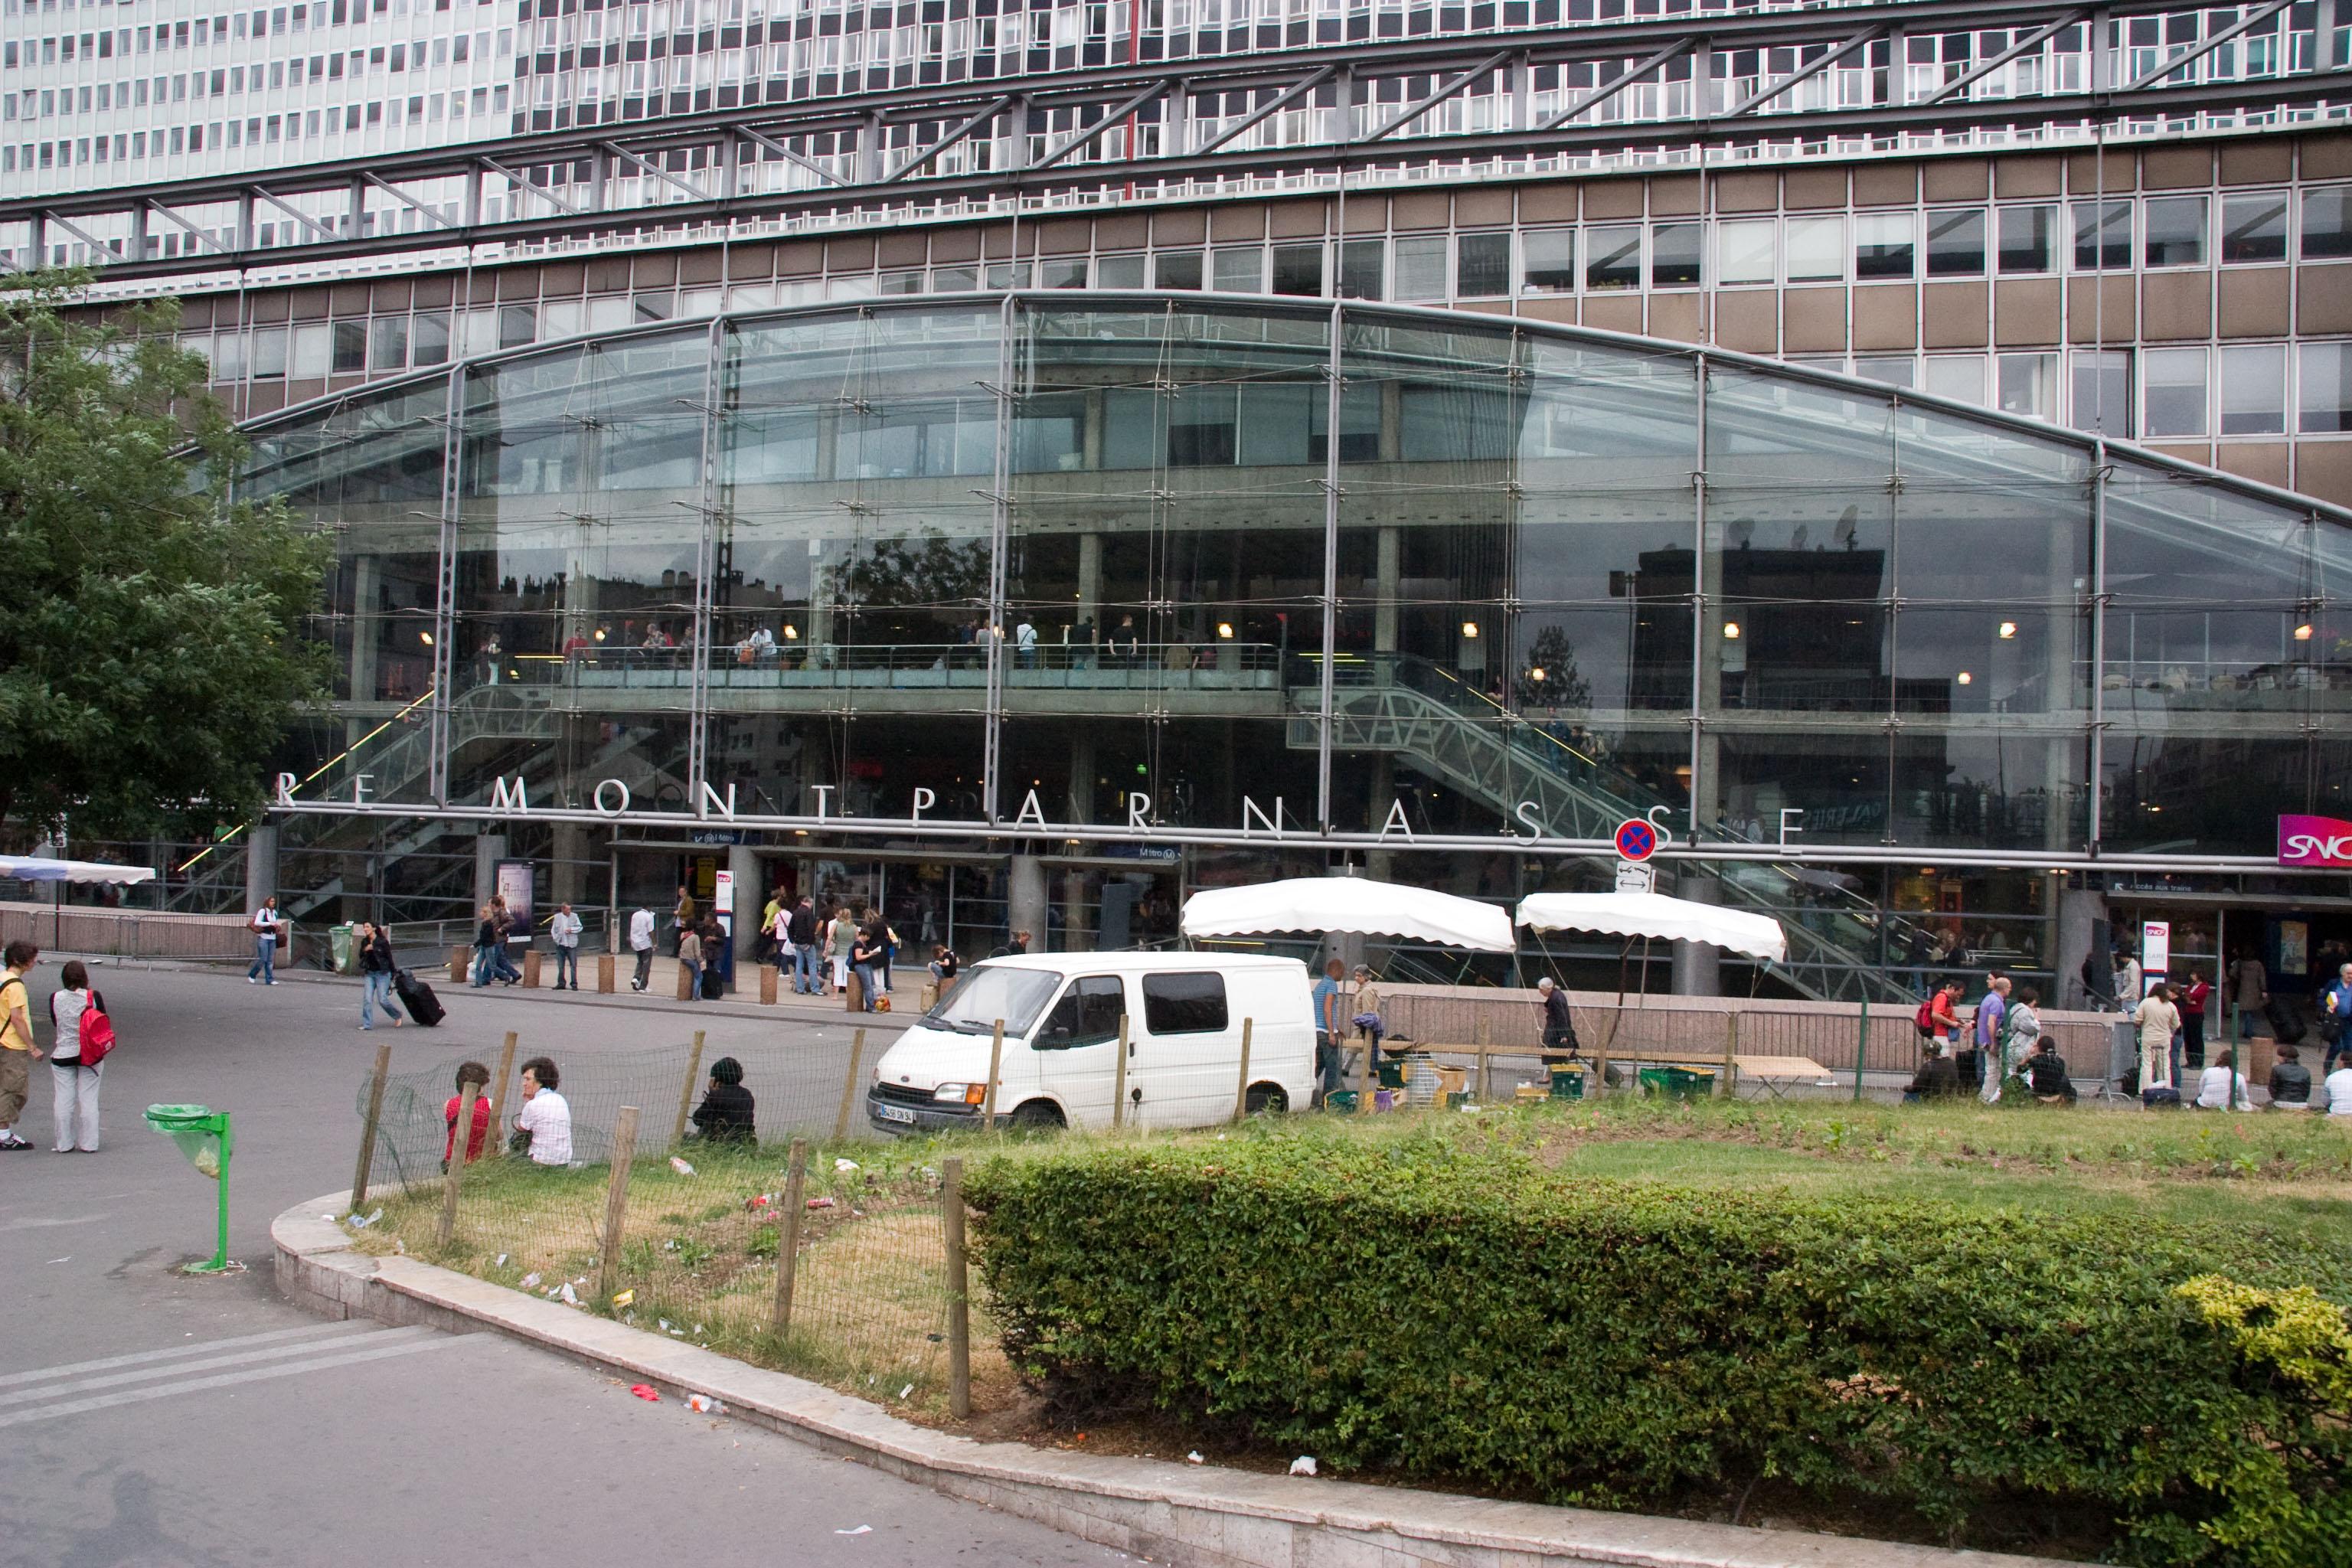 File gare montparnasse crw wikimedia commons - Bureau de change montparnasse gare ...